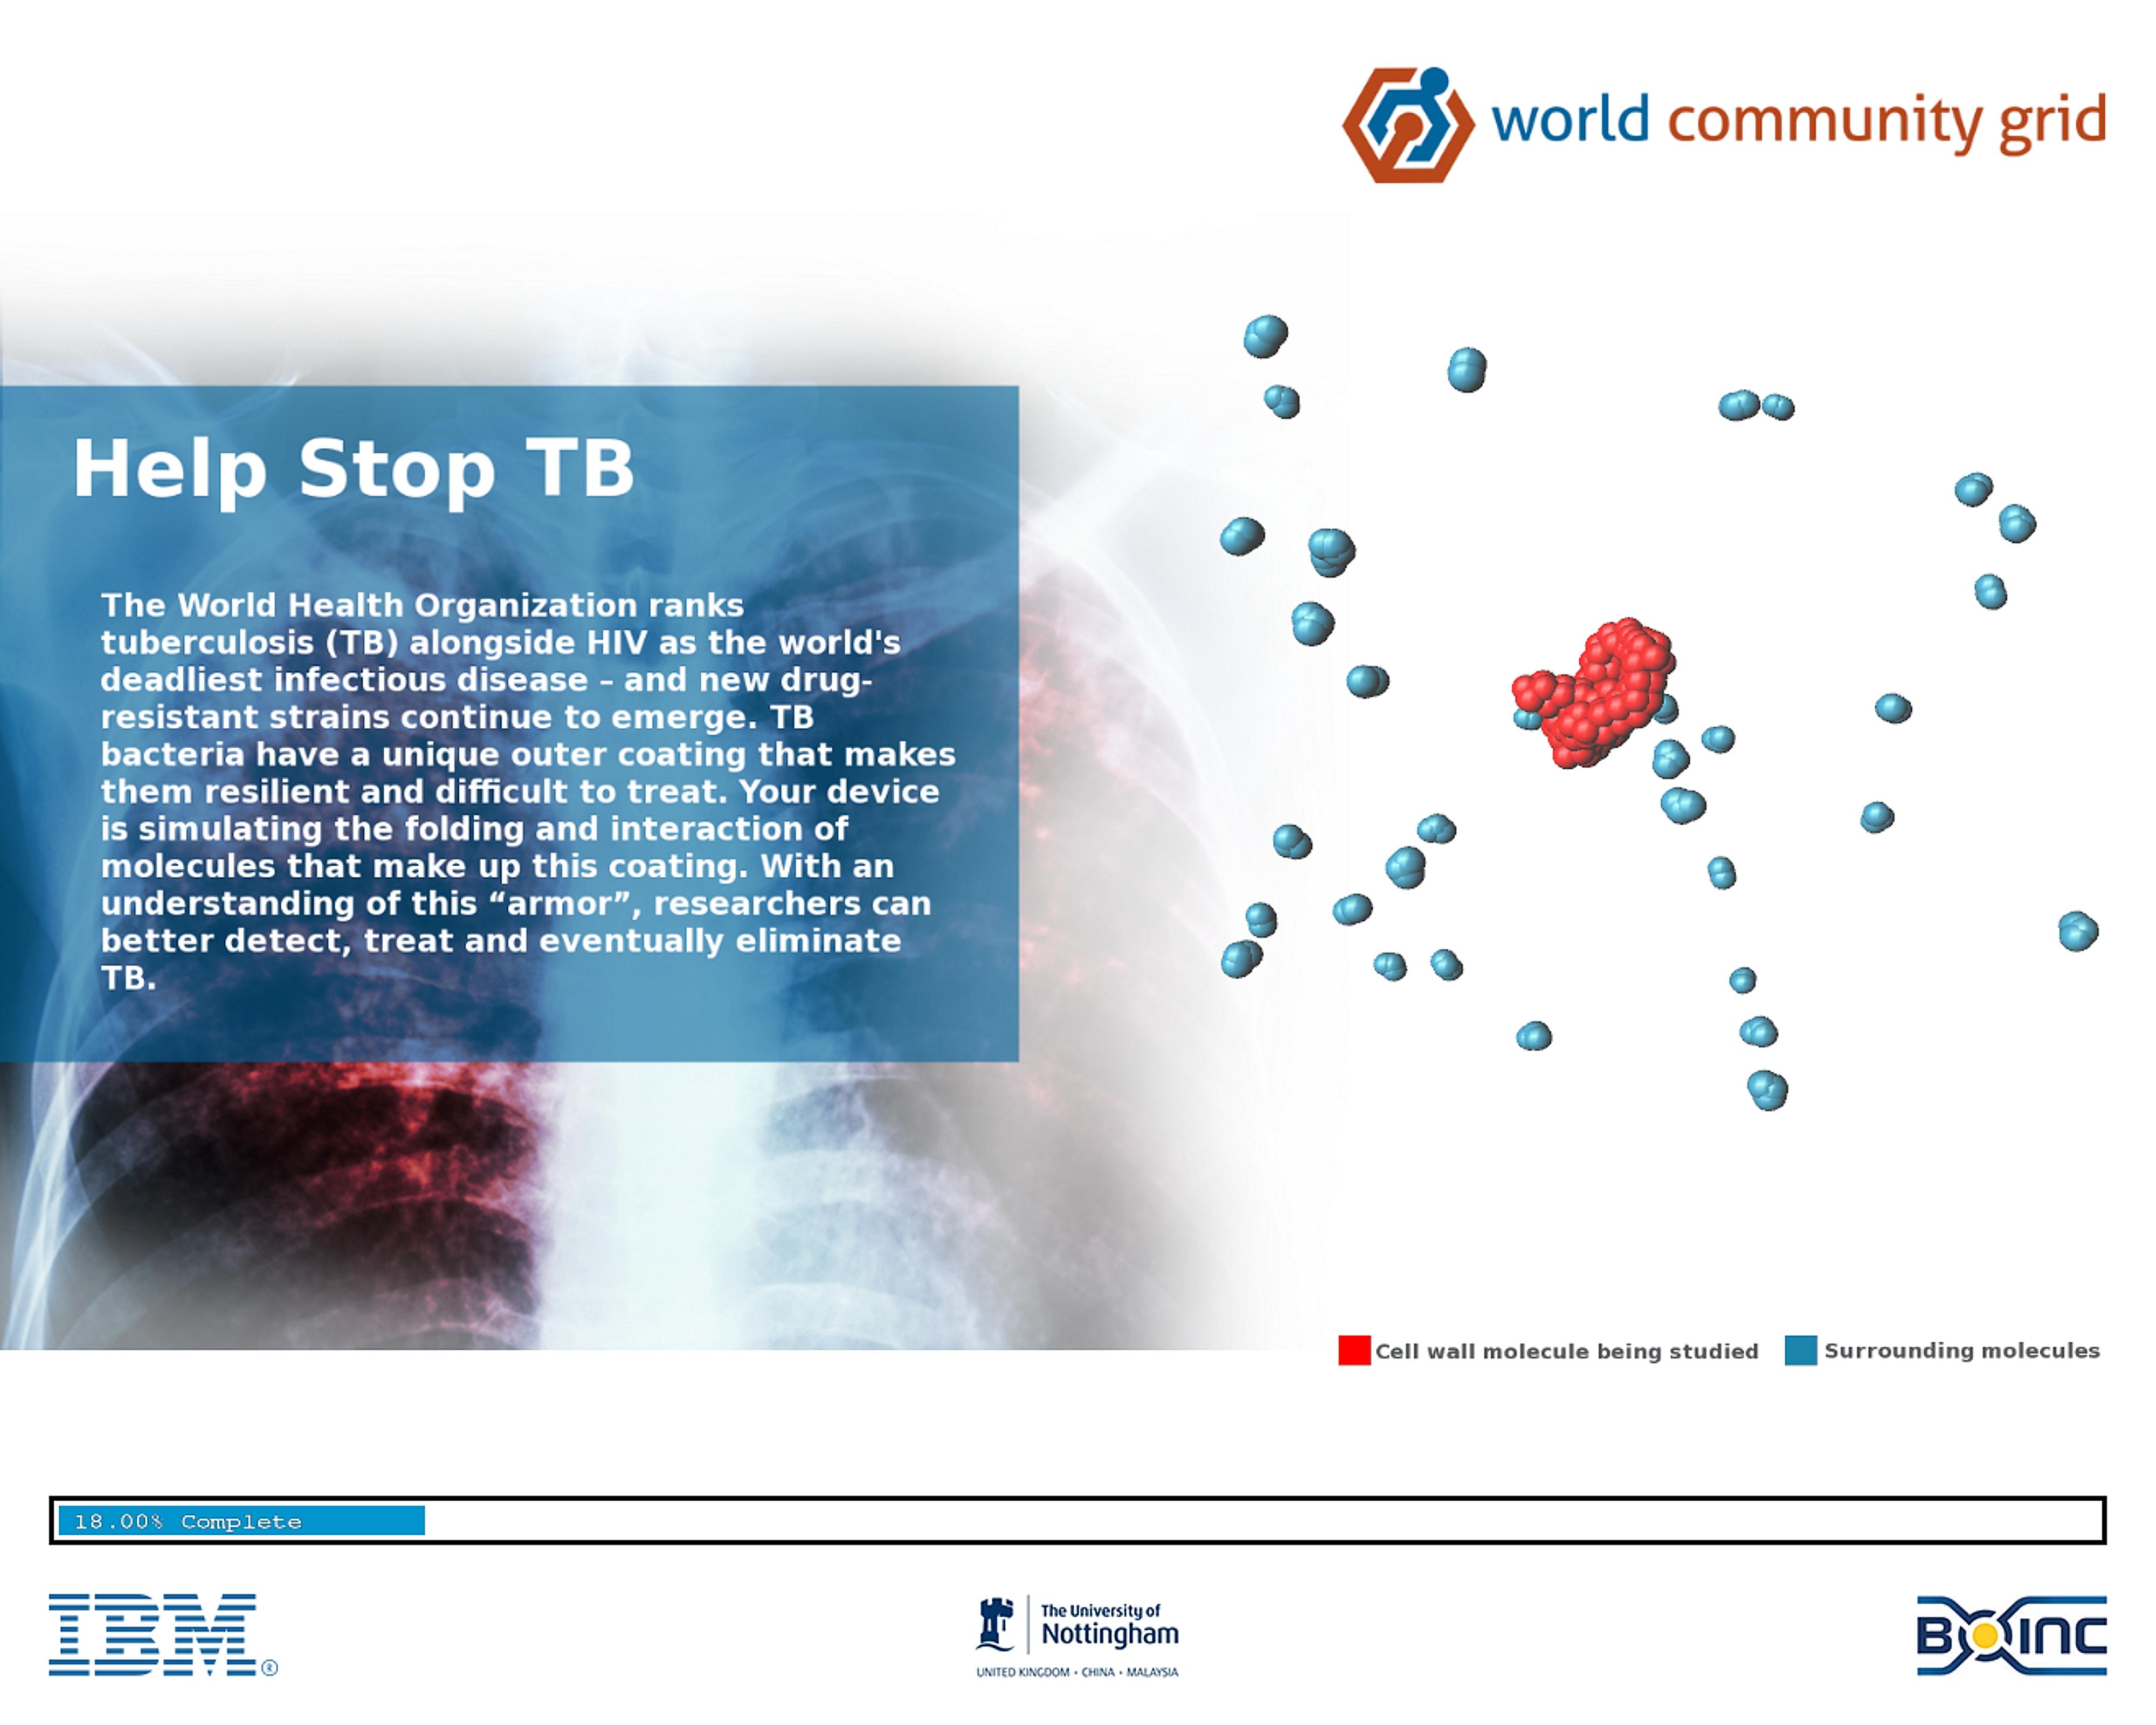 World Community Grid - Help